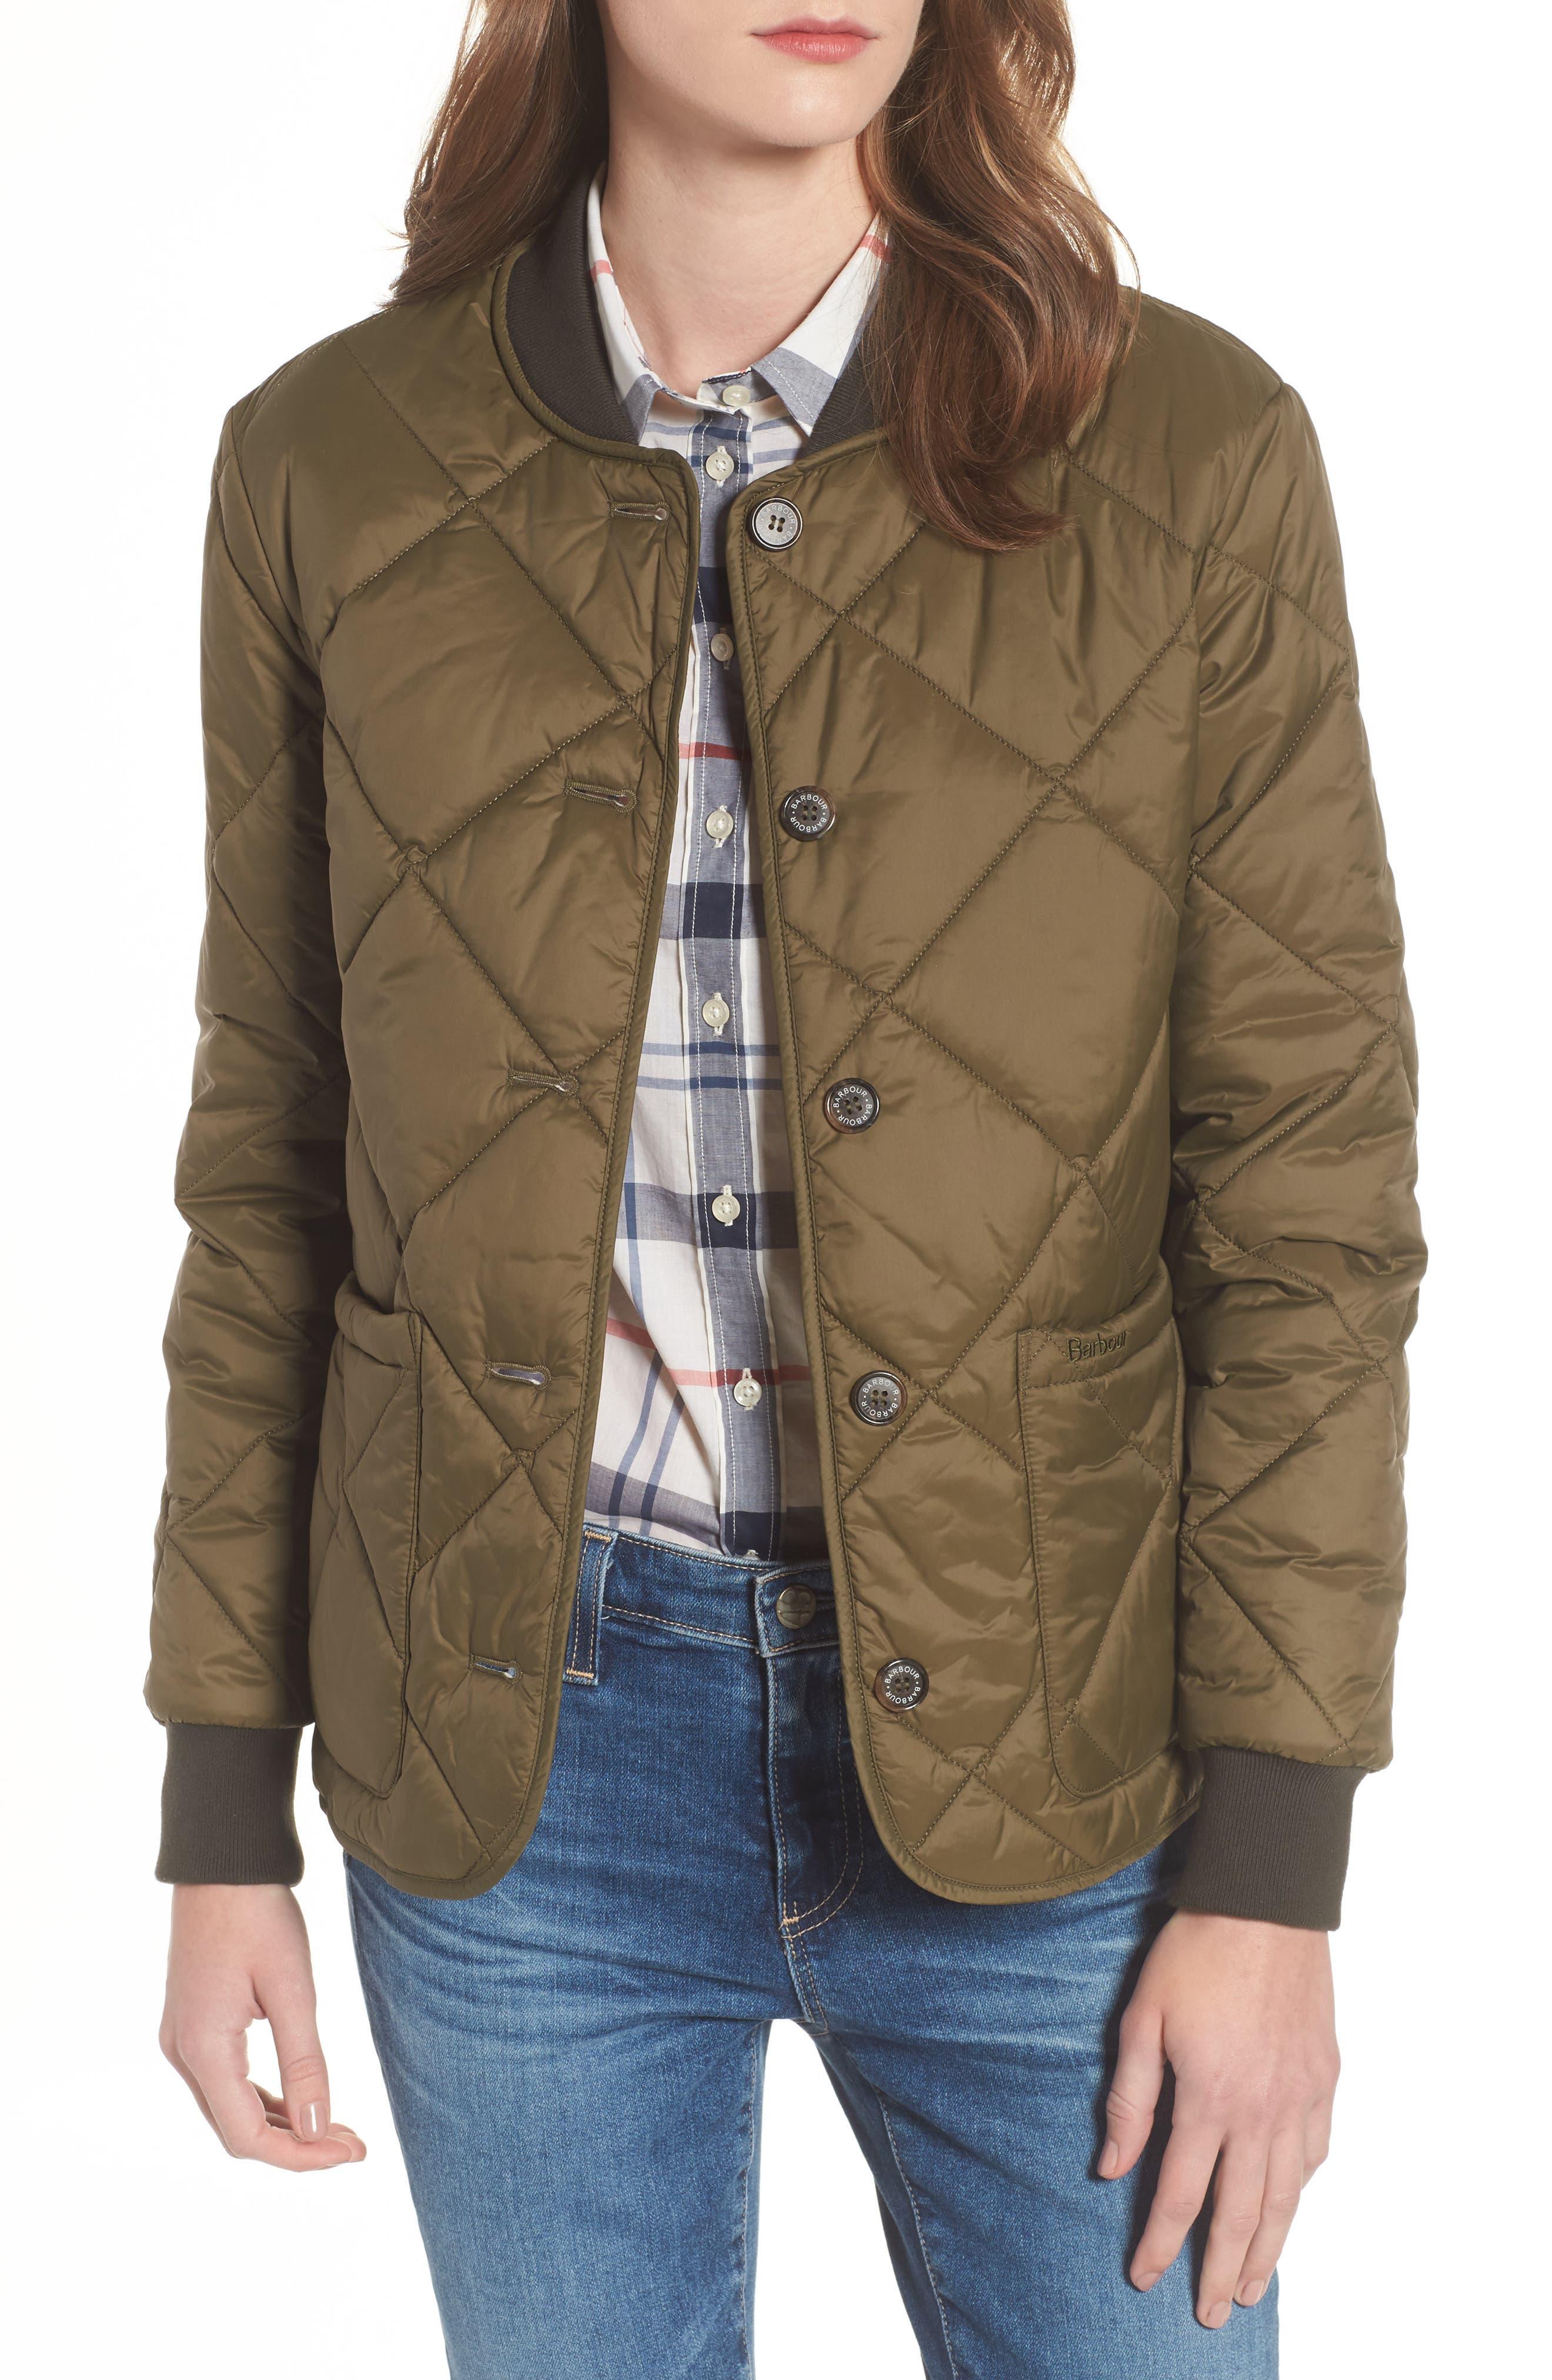 Freckleton Jacket,                             Main thumbnail 1, color,                             340